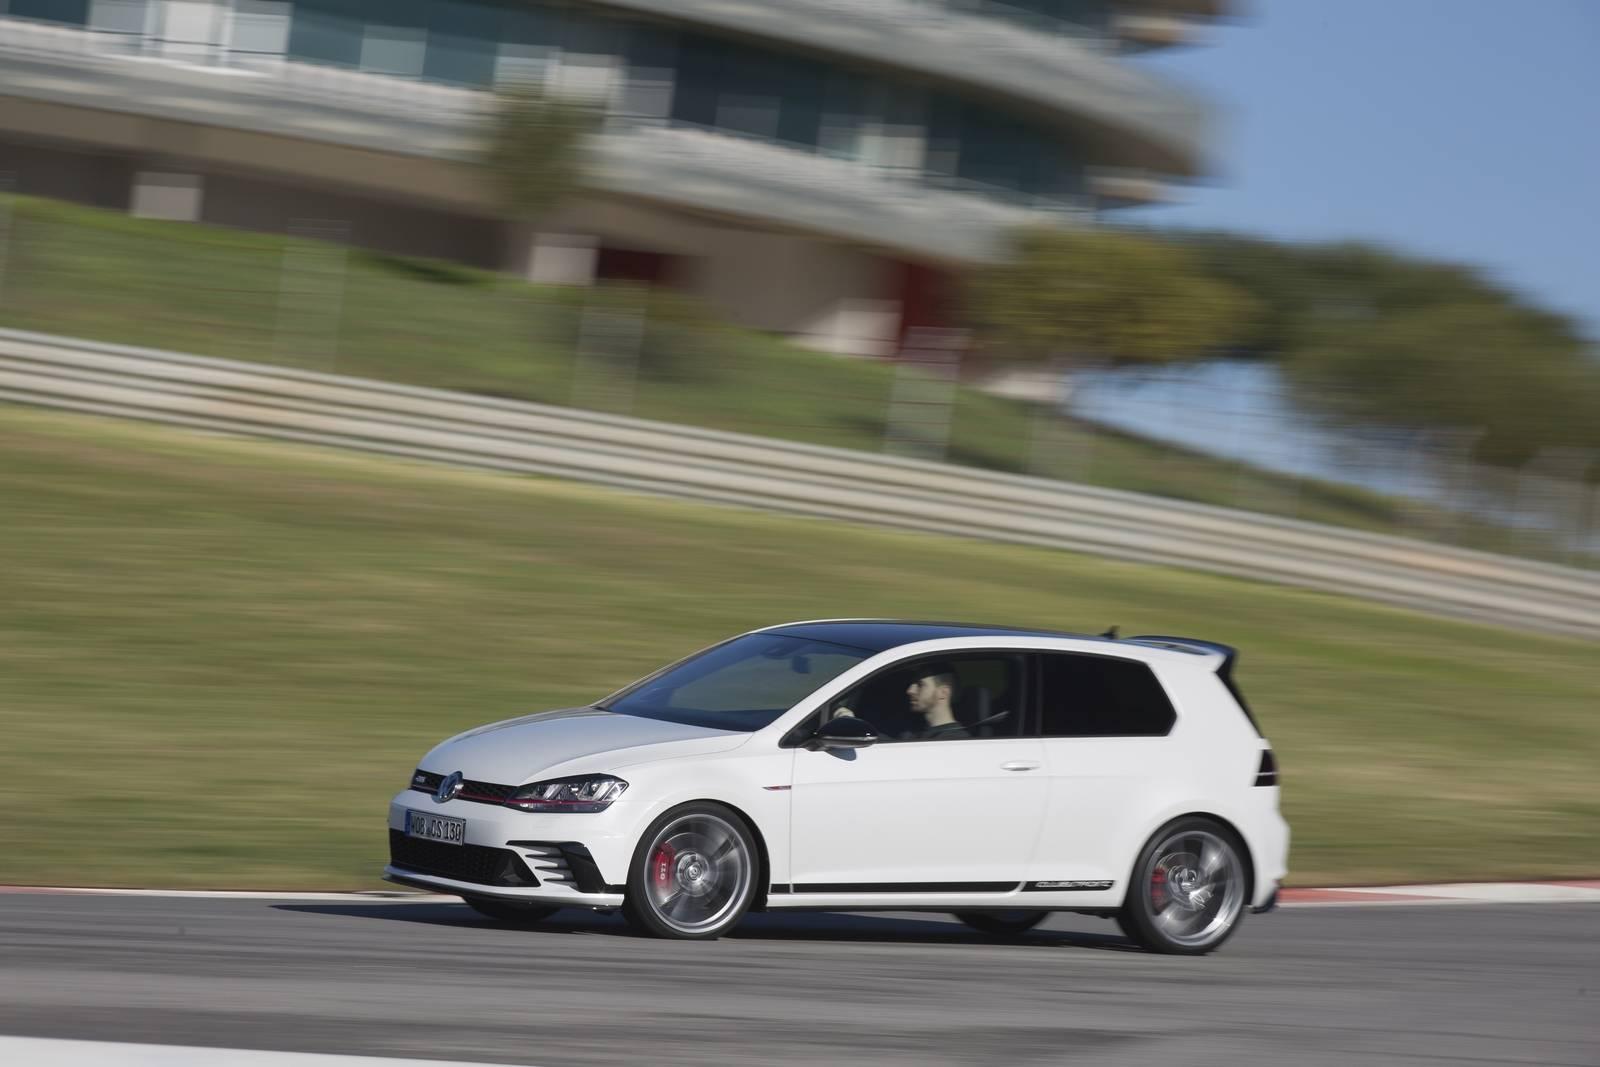 VW Golf GTI Clubsport track